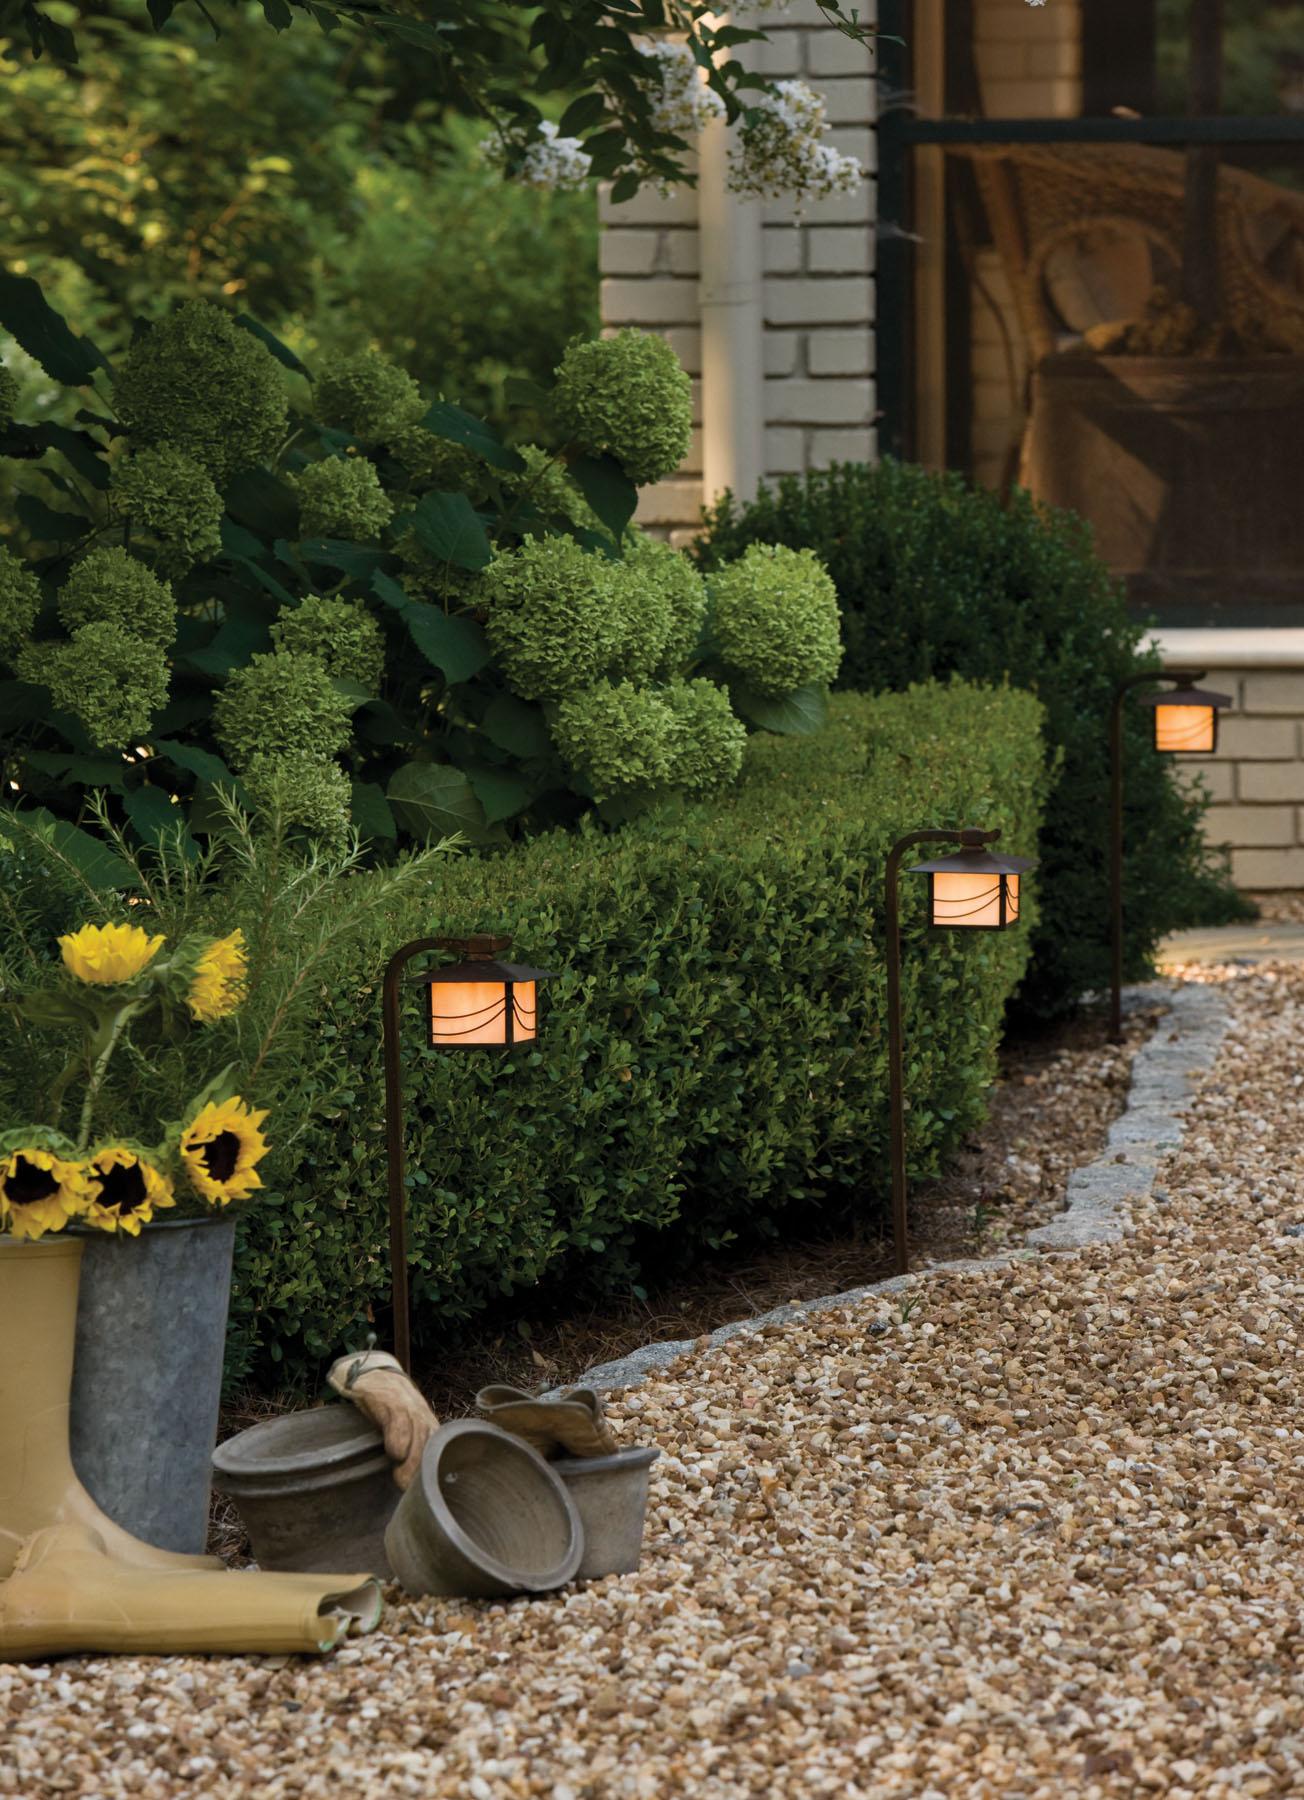 Outdoor Lighting Supply The magic of outdoor lighting newton electrical supply hinkley exteriorsm workwithnaturefo